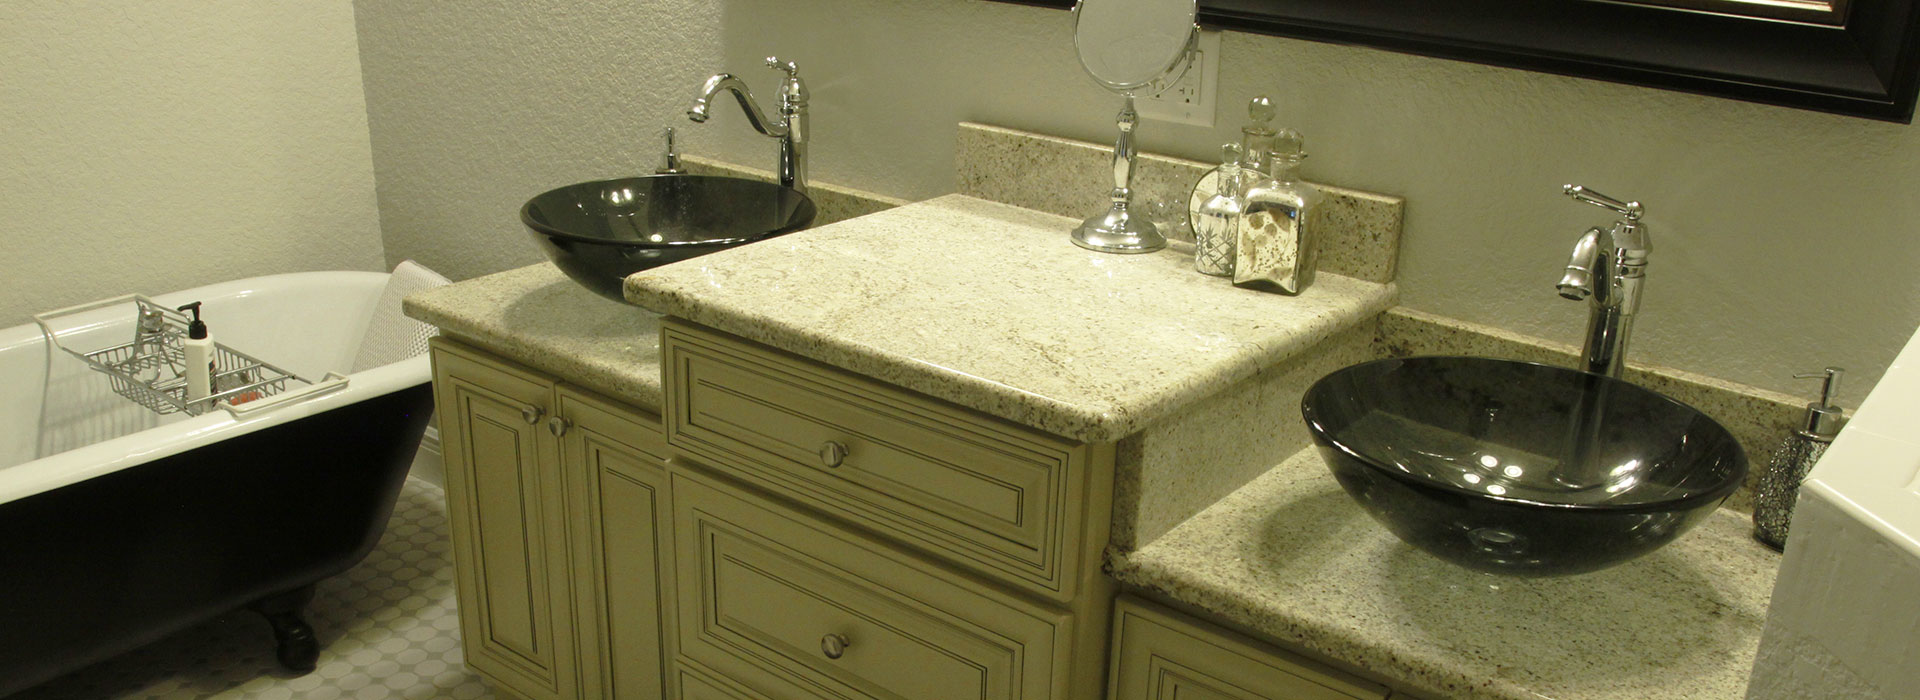 Kitchen And Bath Excalibur Kitchen And Bath Llc Ocala Florida